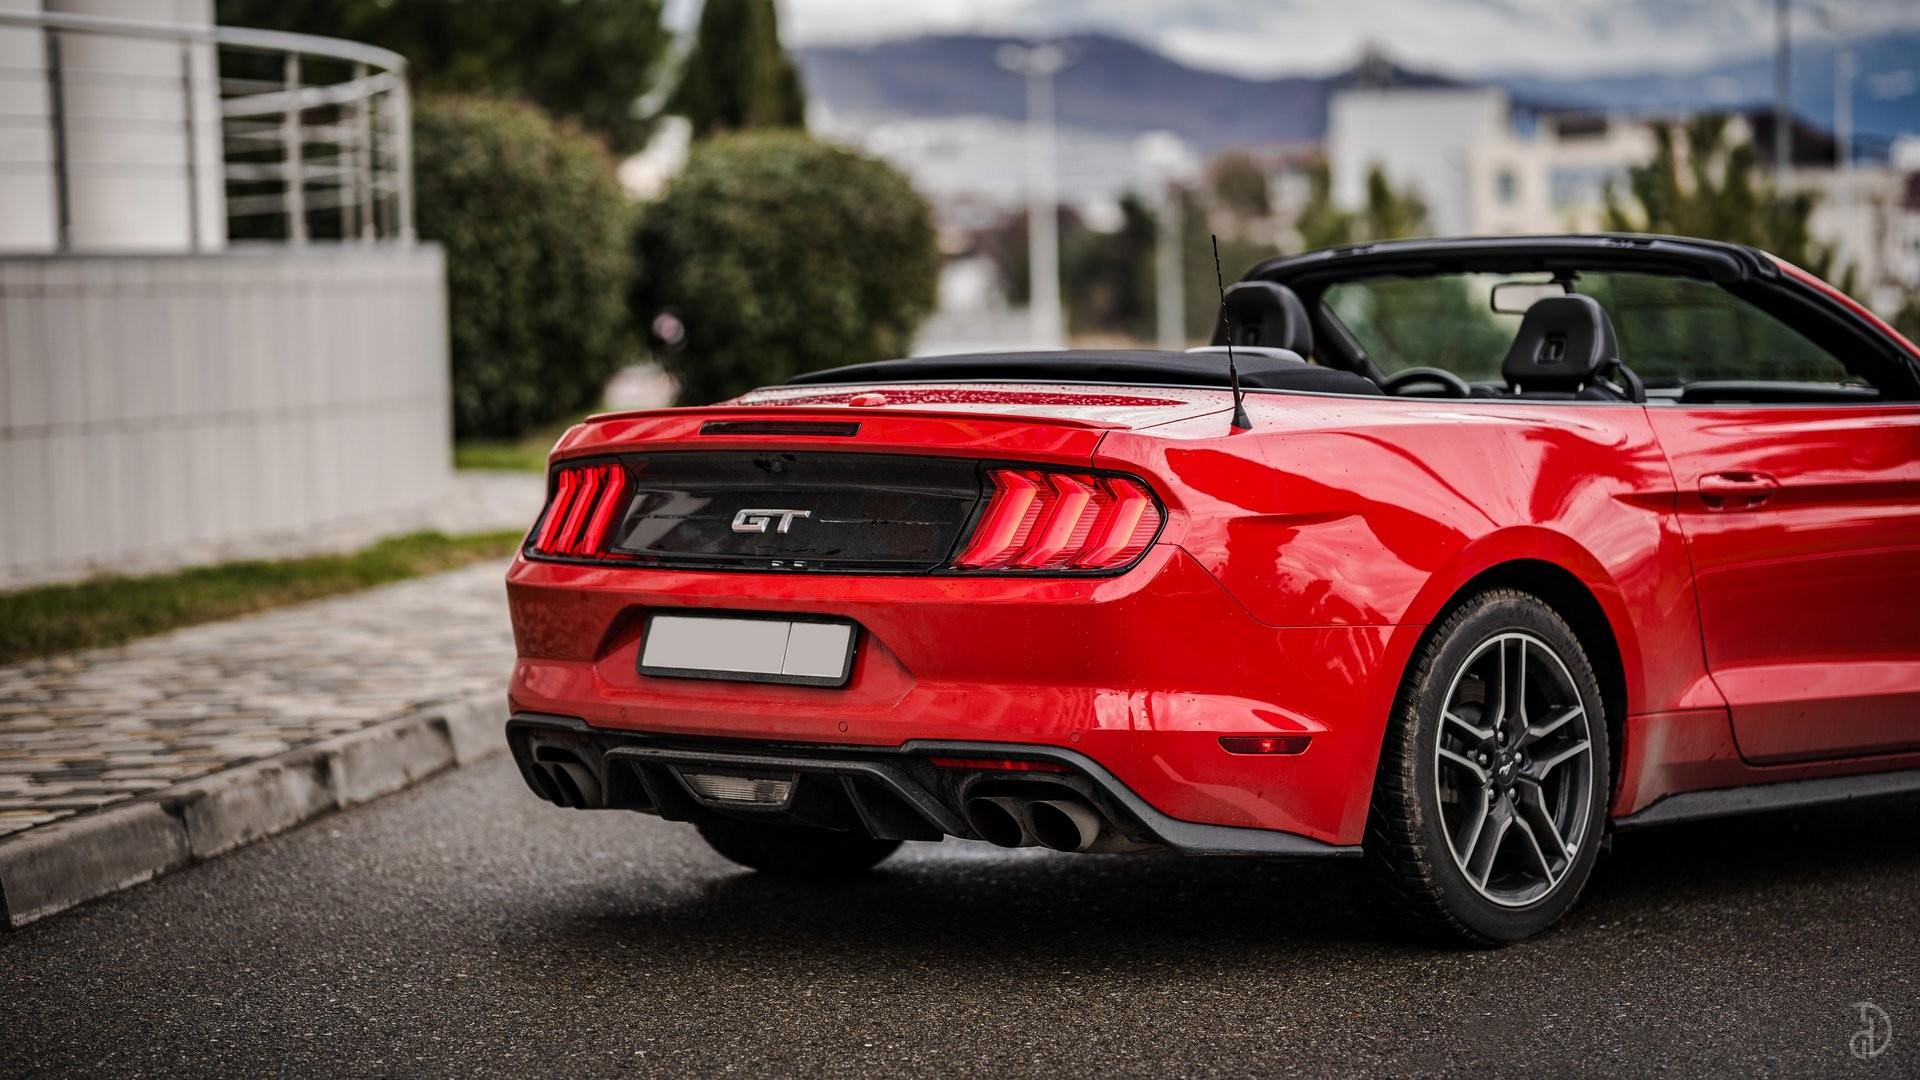 Аренда Ford Mustang GT 5.0 в Сочи. Фото 5